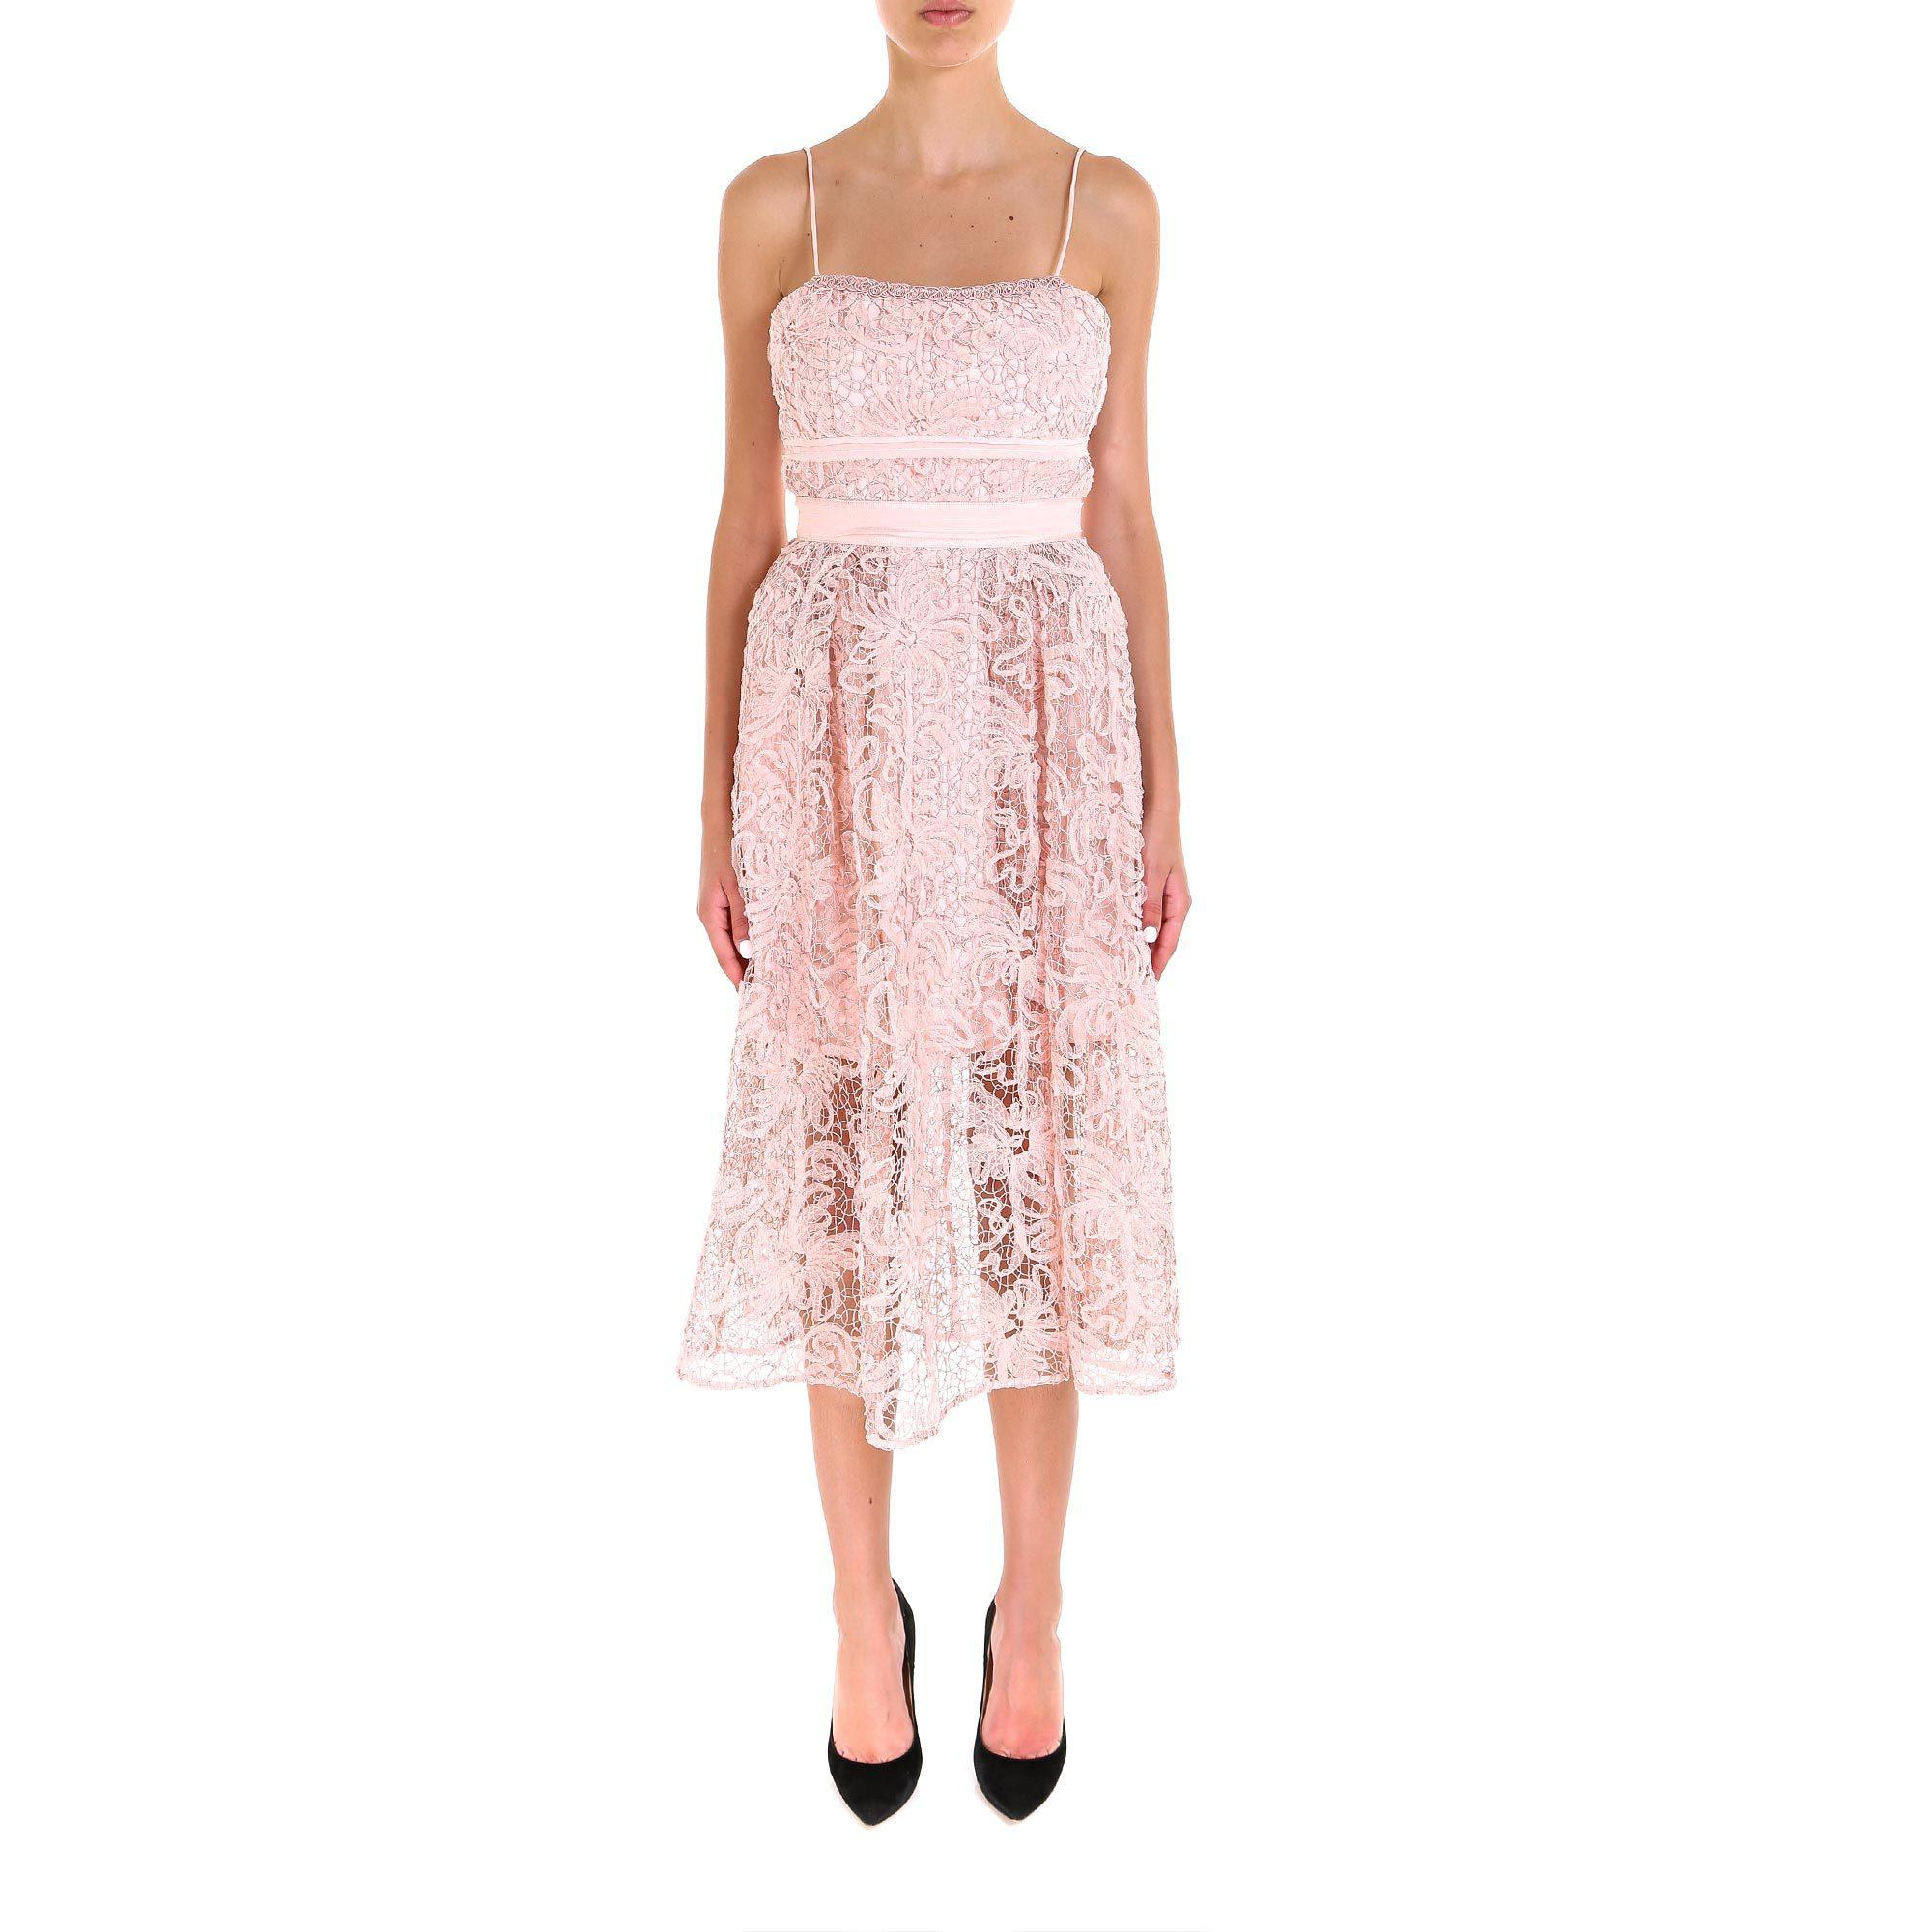 e3d53bcf03c5 Self-Portrait Lace Midi Dress in Pink - Lyst